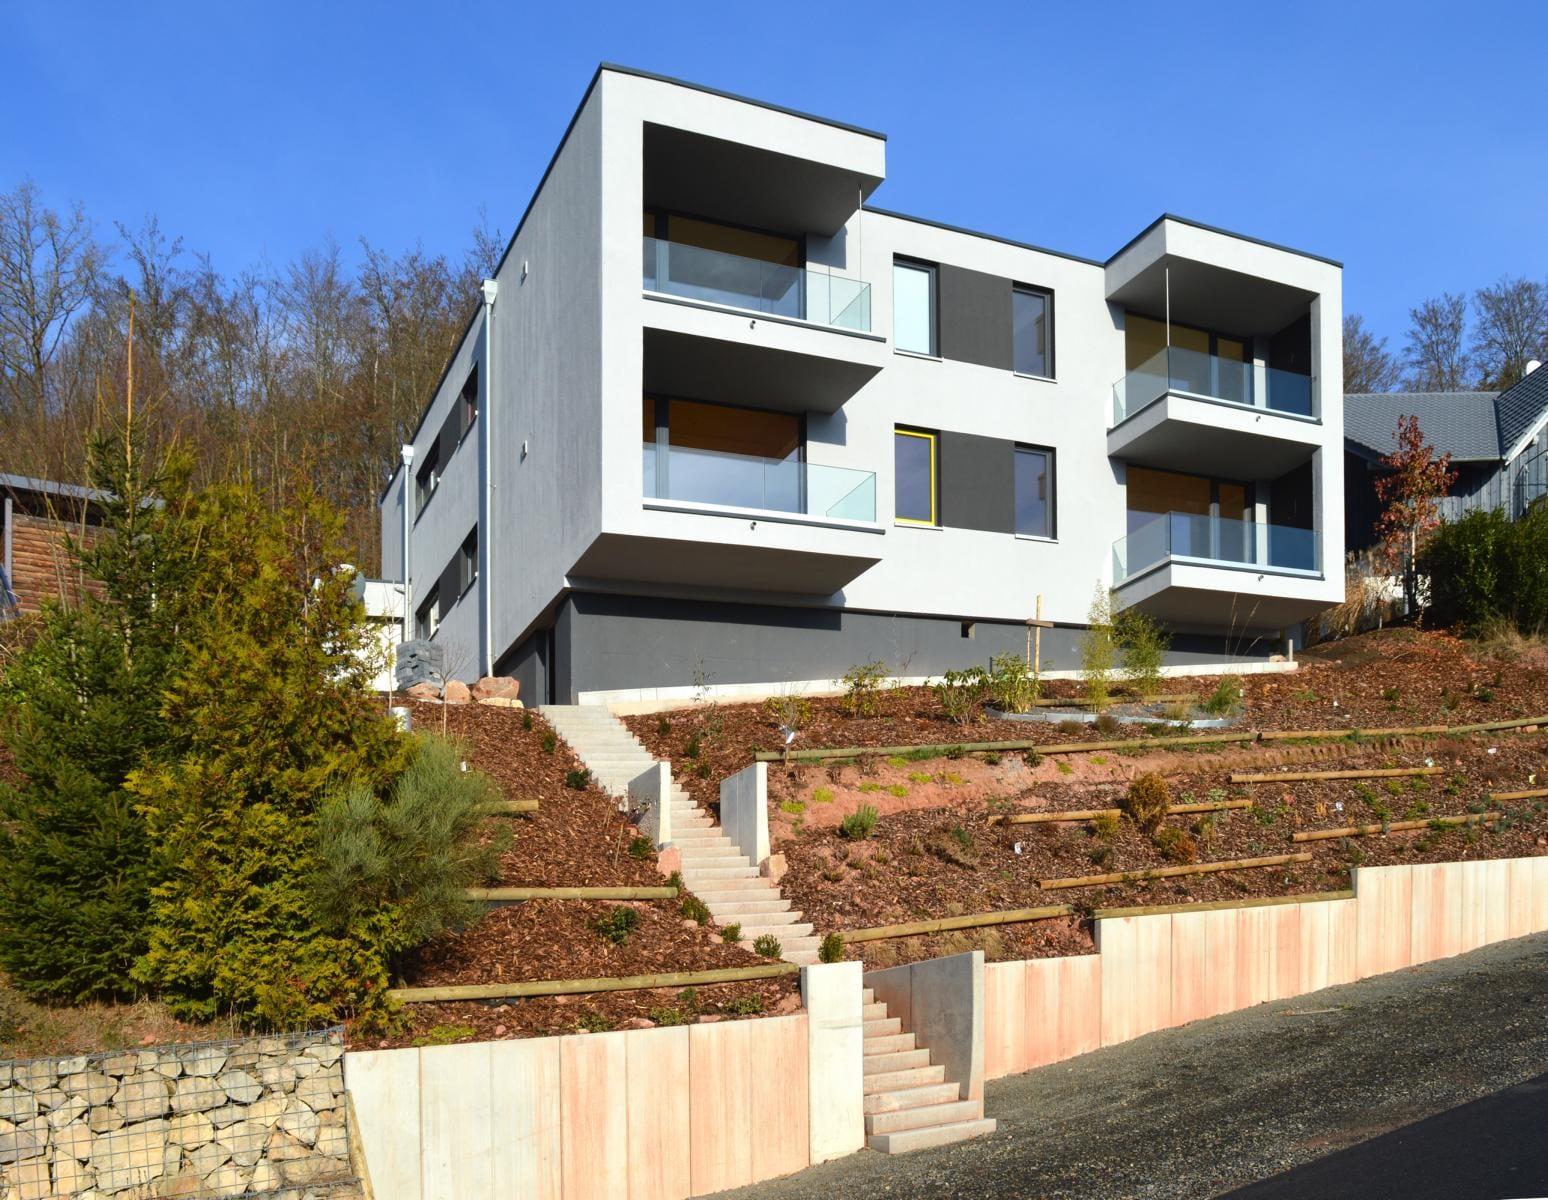 Büro und Mehrfamilienhaus Bad Brückenau - holzius